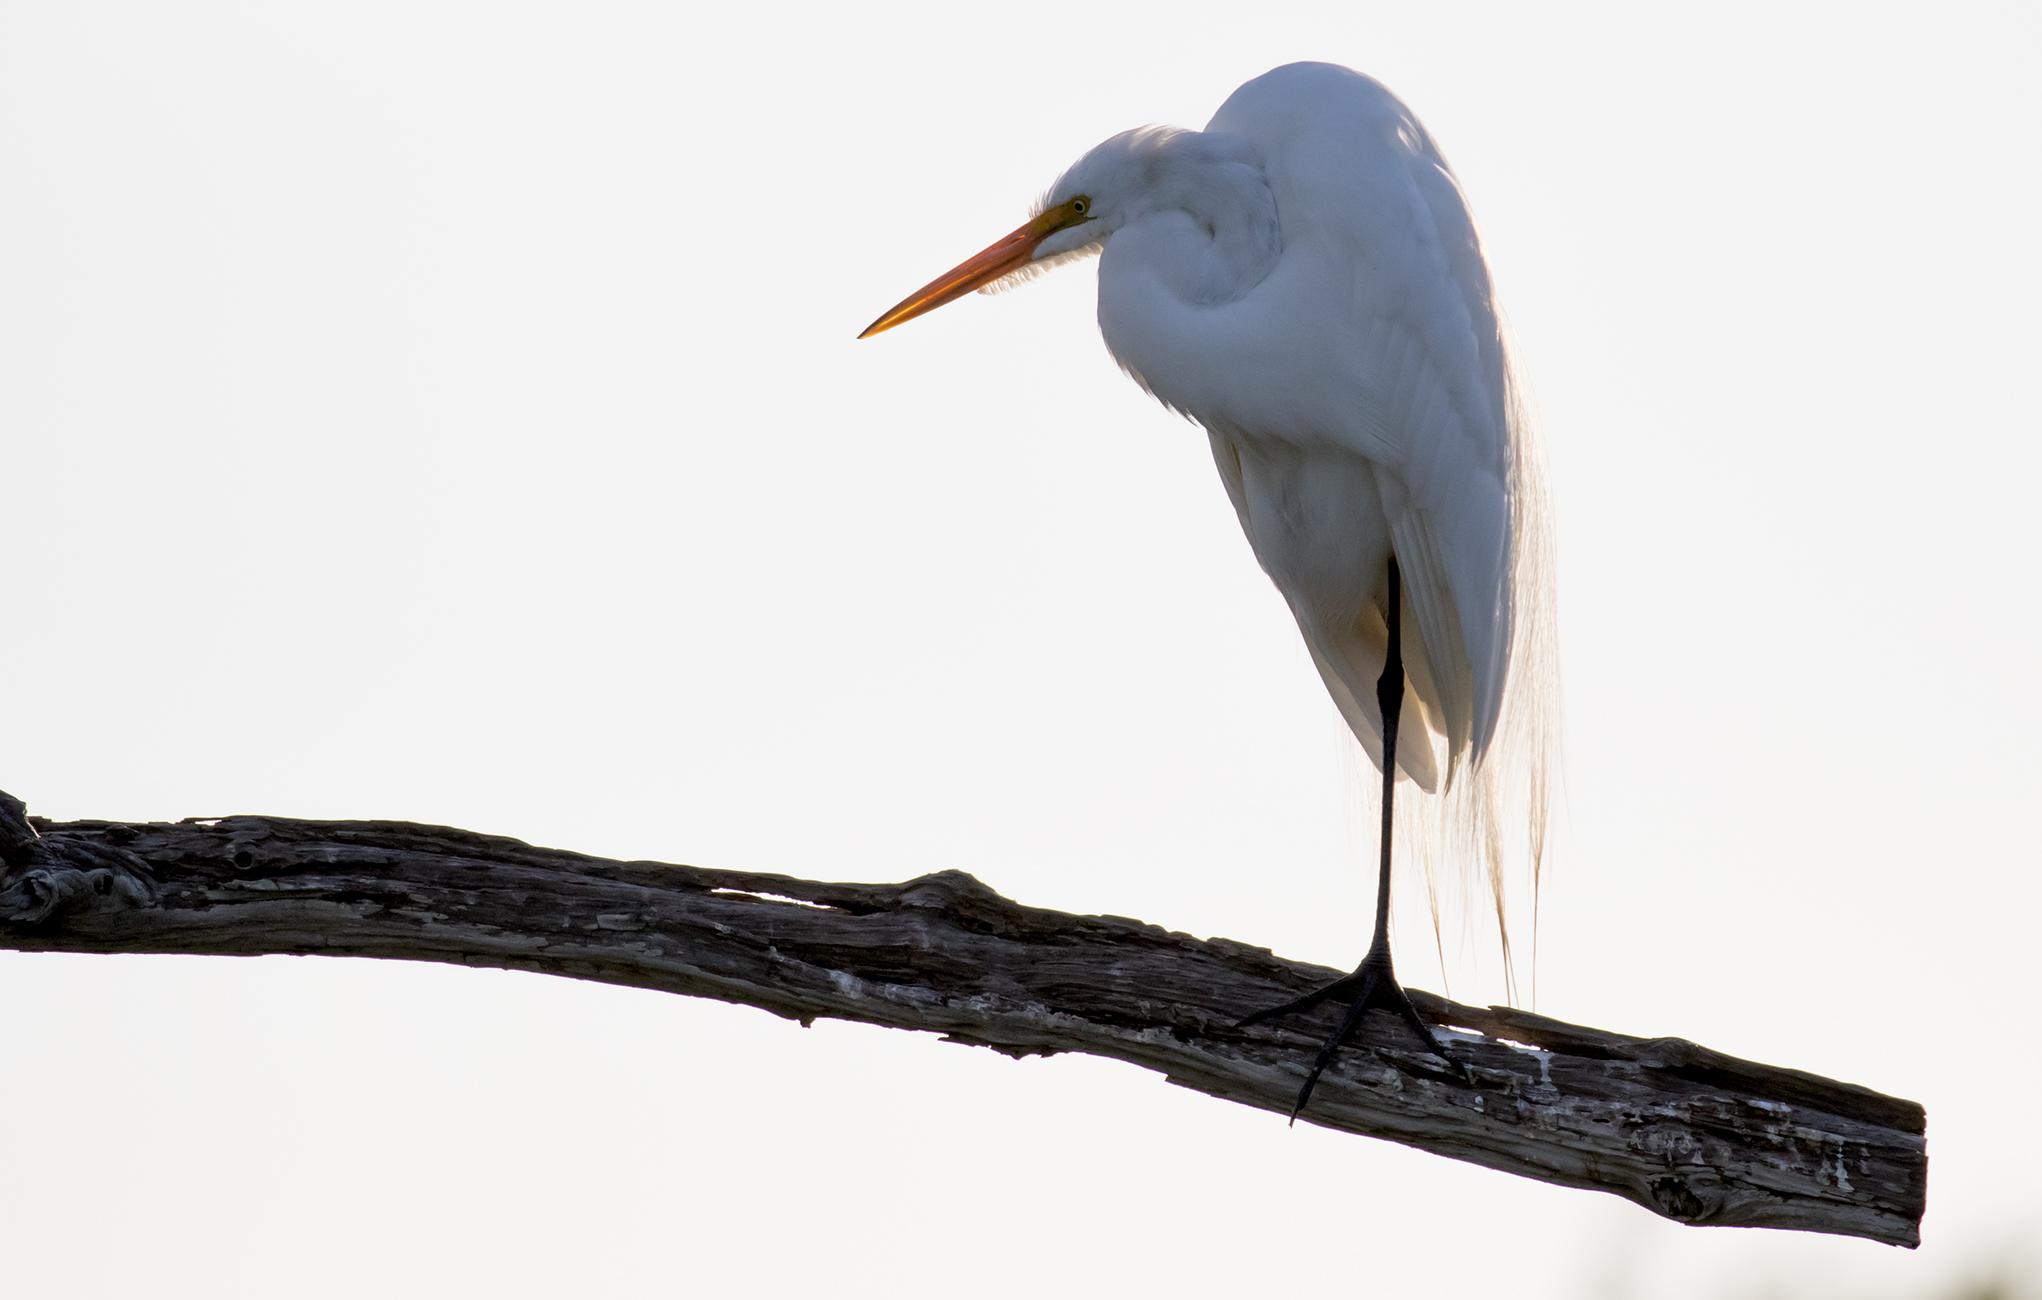 Adult Great Egret